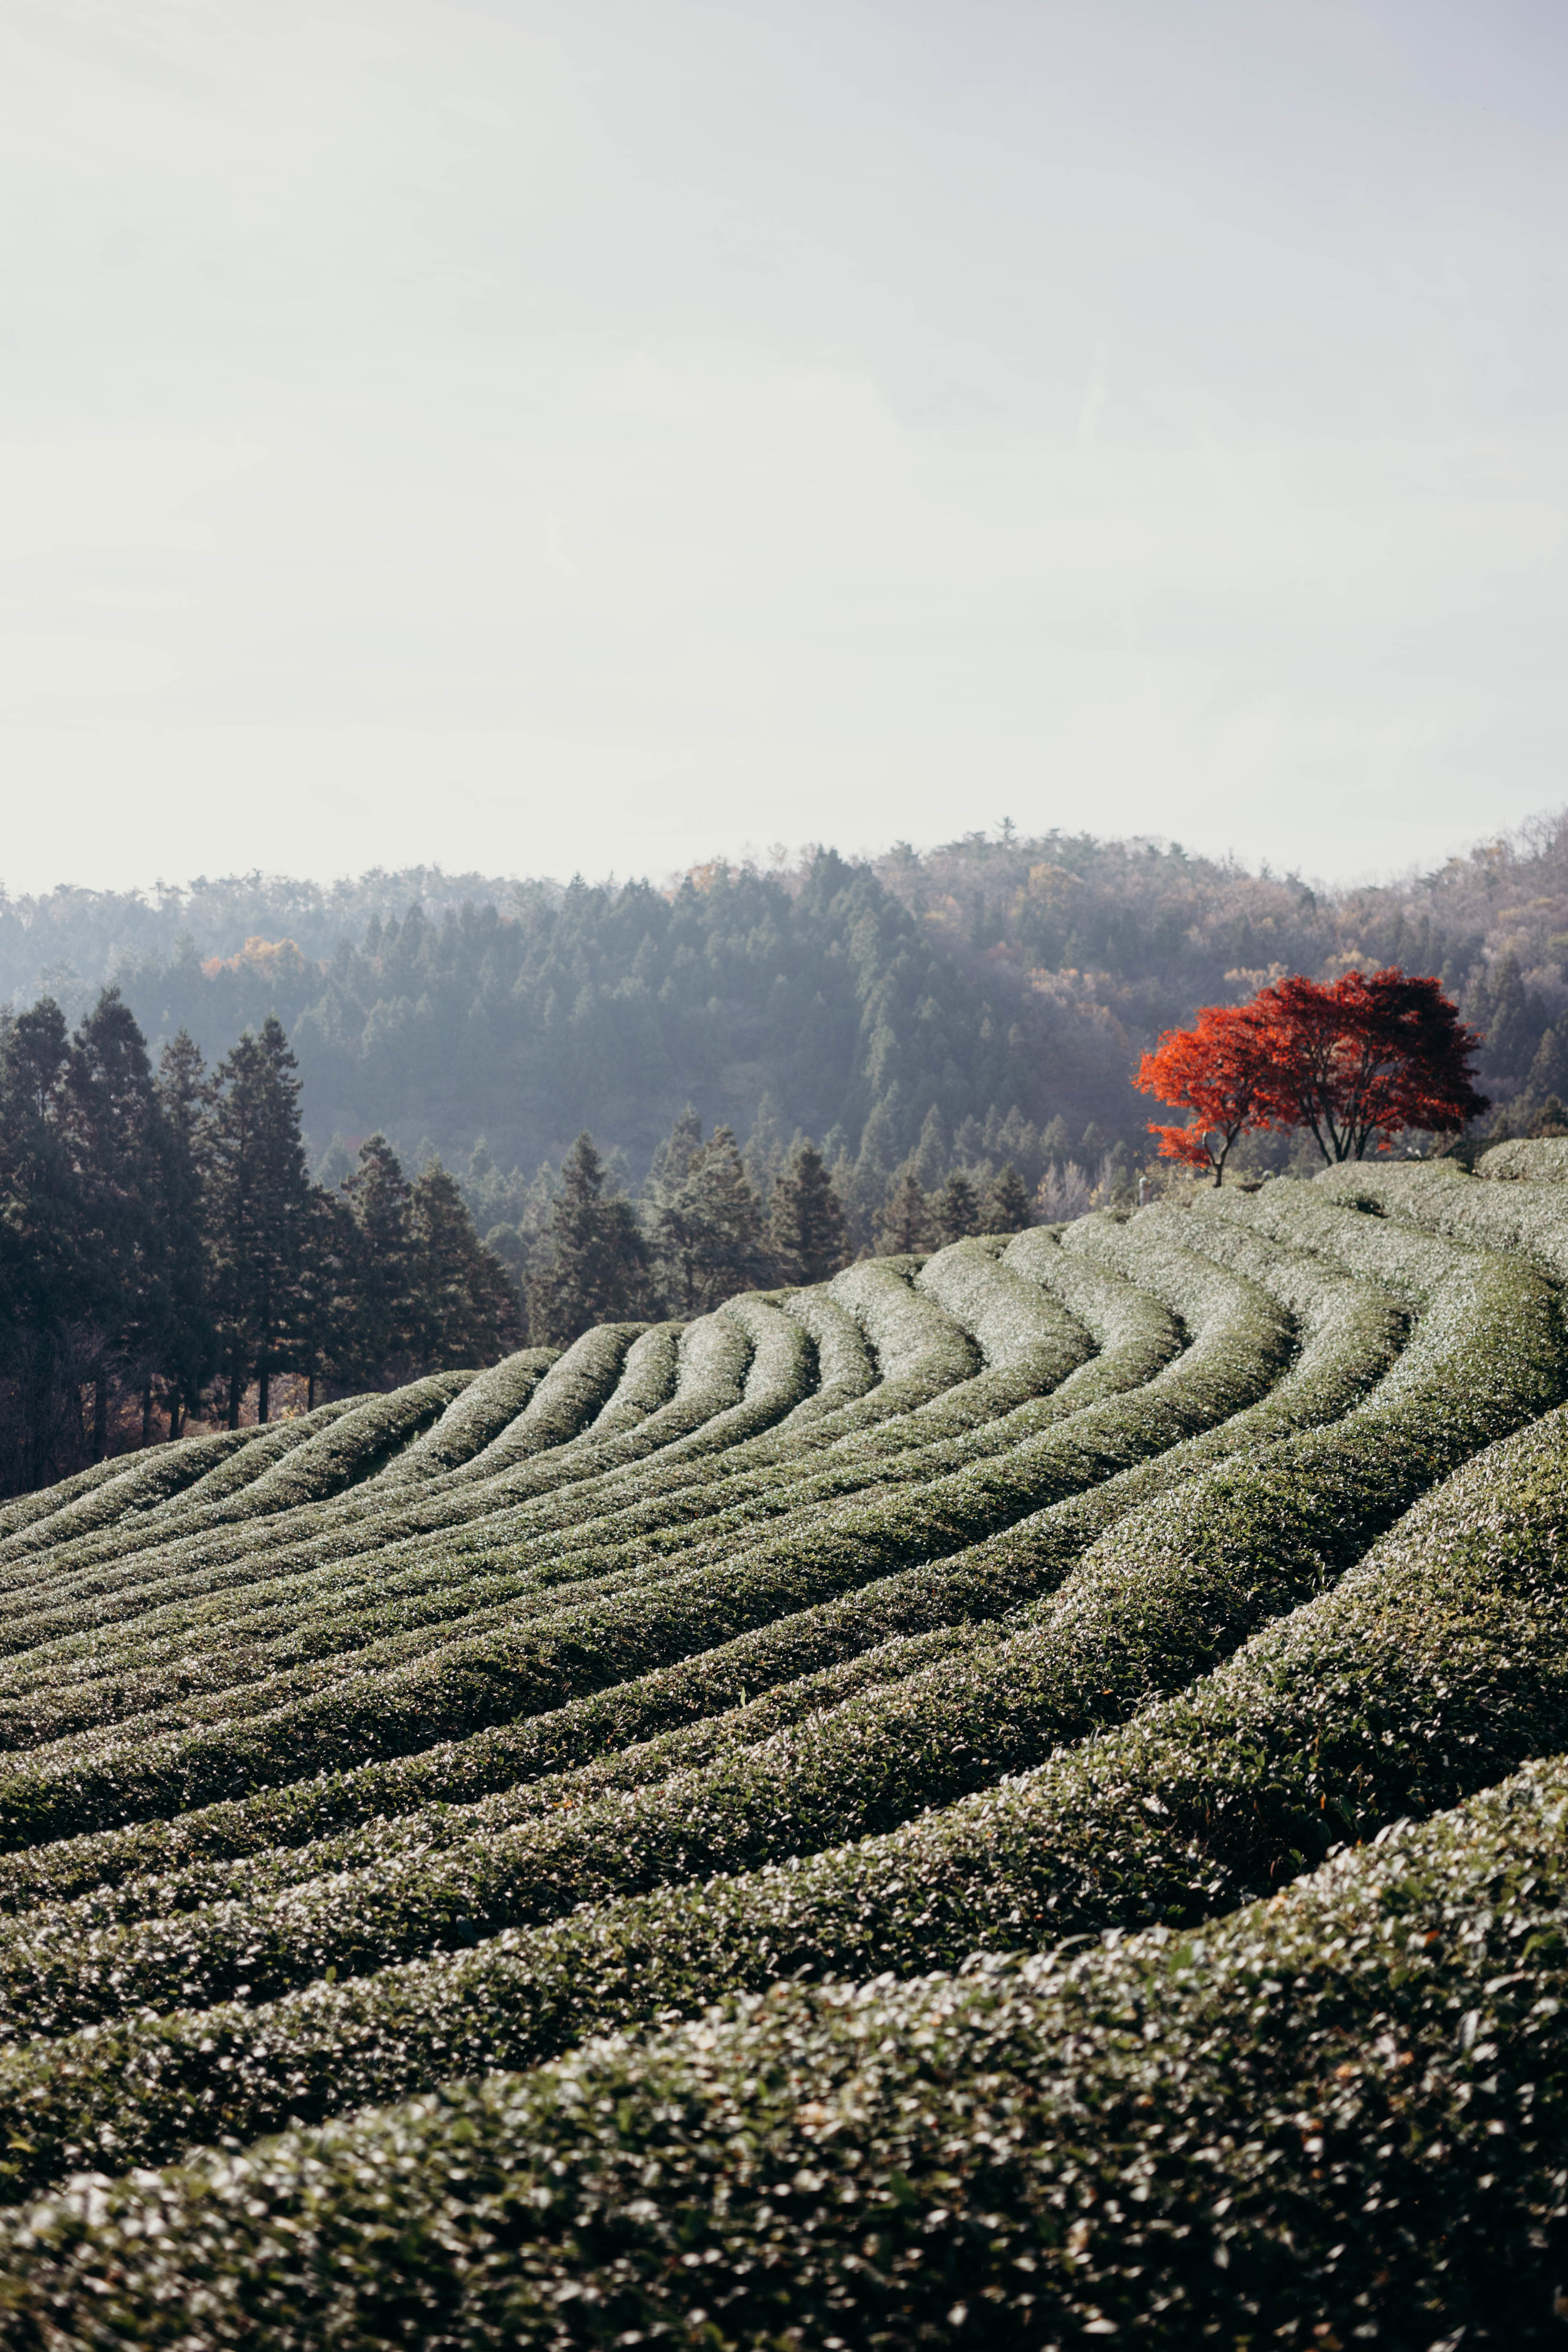 Boseong Green Tea Fields, South Korea   On the Street Where We Live ( aretherelilactrees.com )  Boseong, green tea, plantation, 대한다원, 전라남도, Jeollanam-do, South Korea